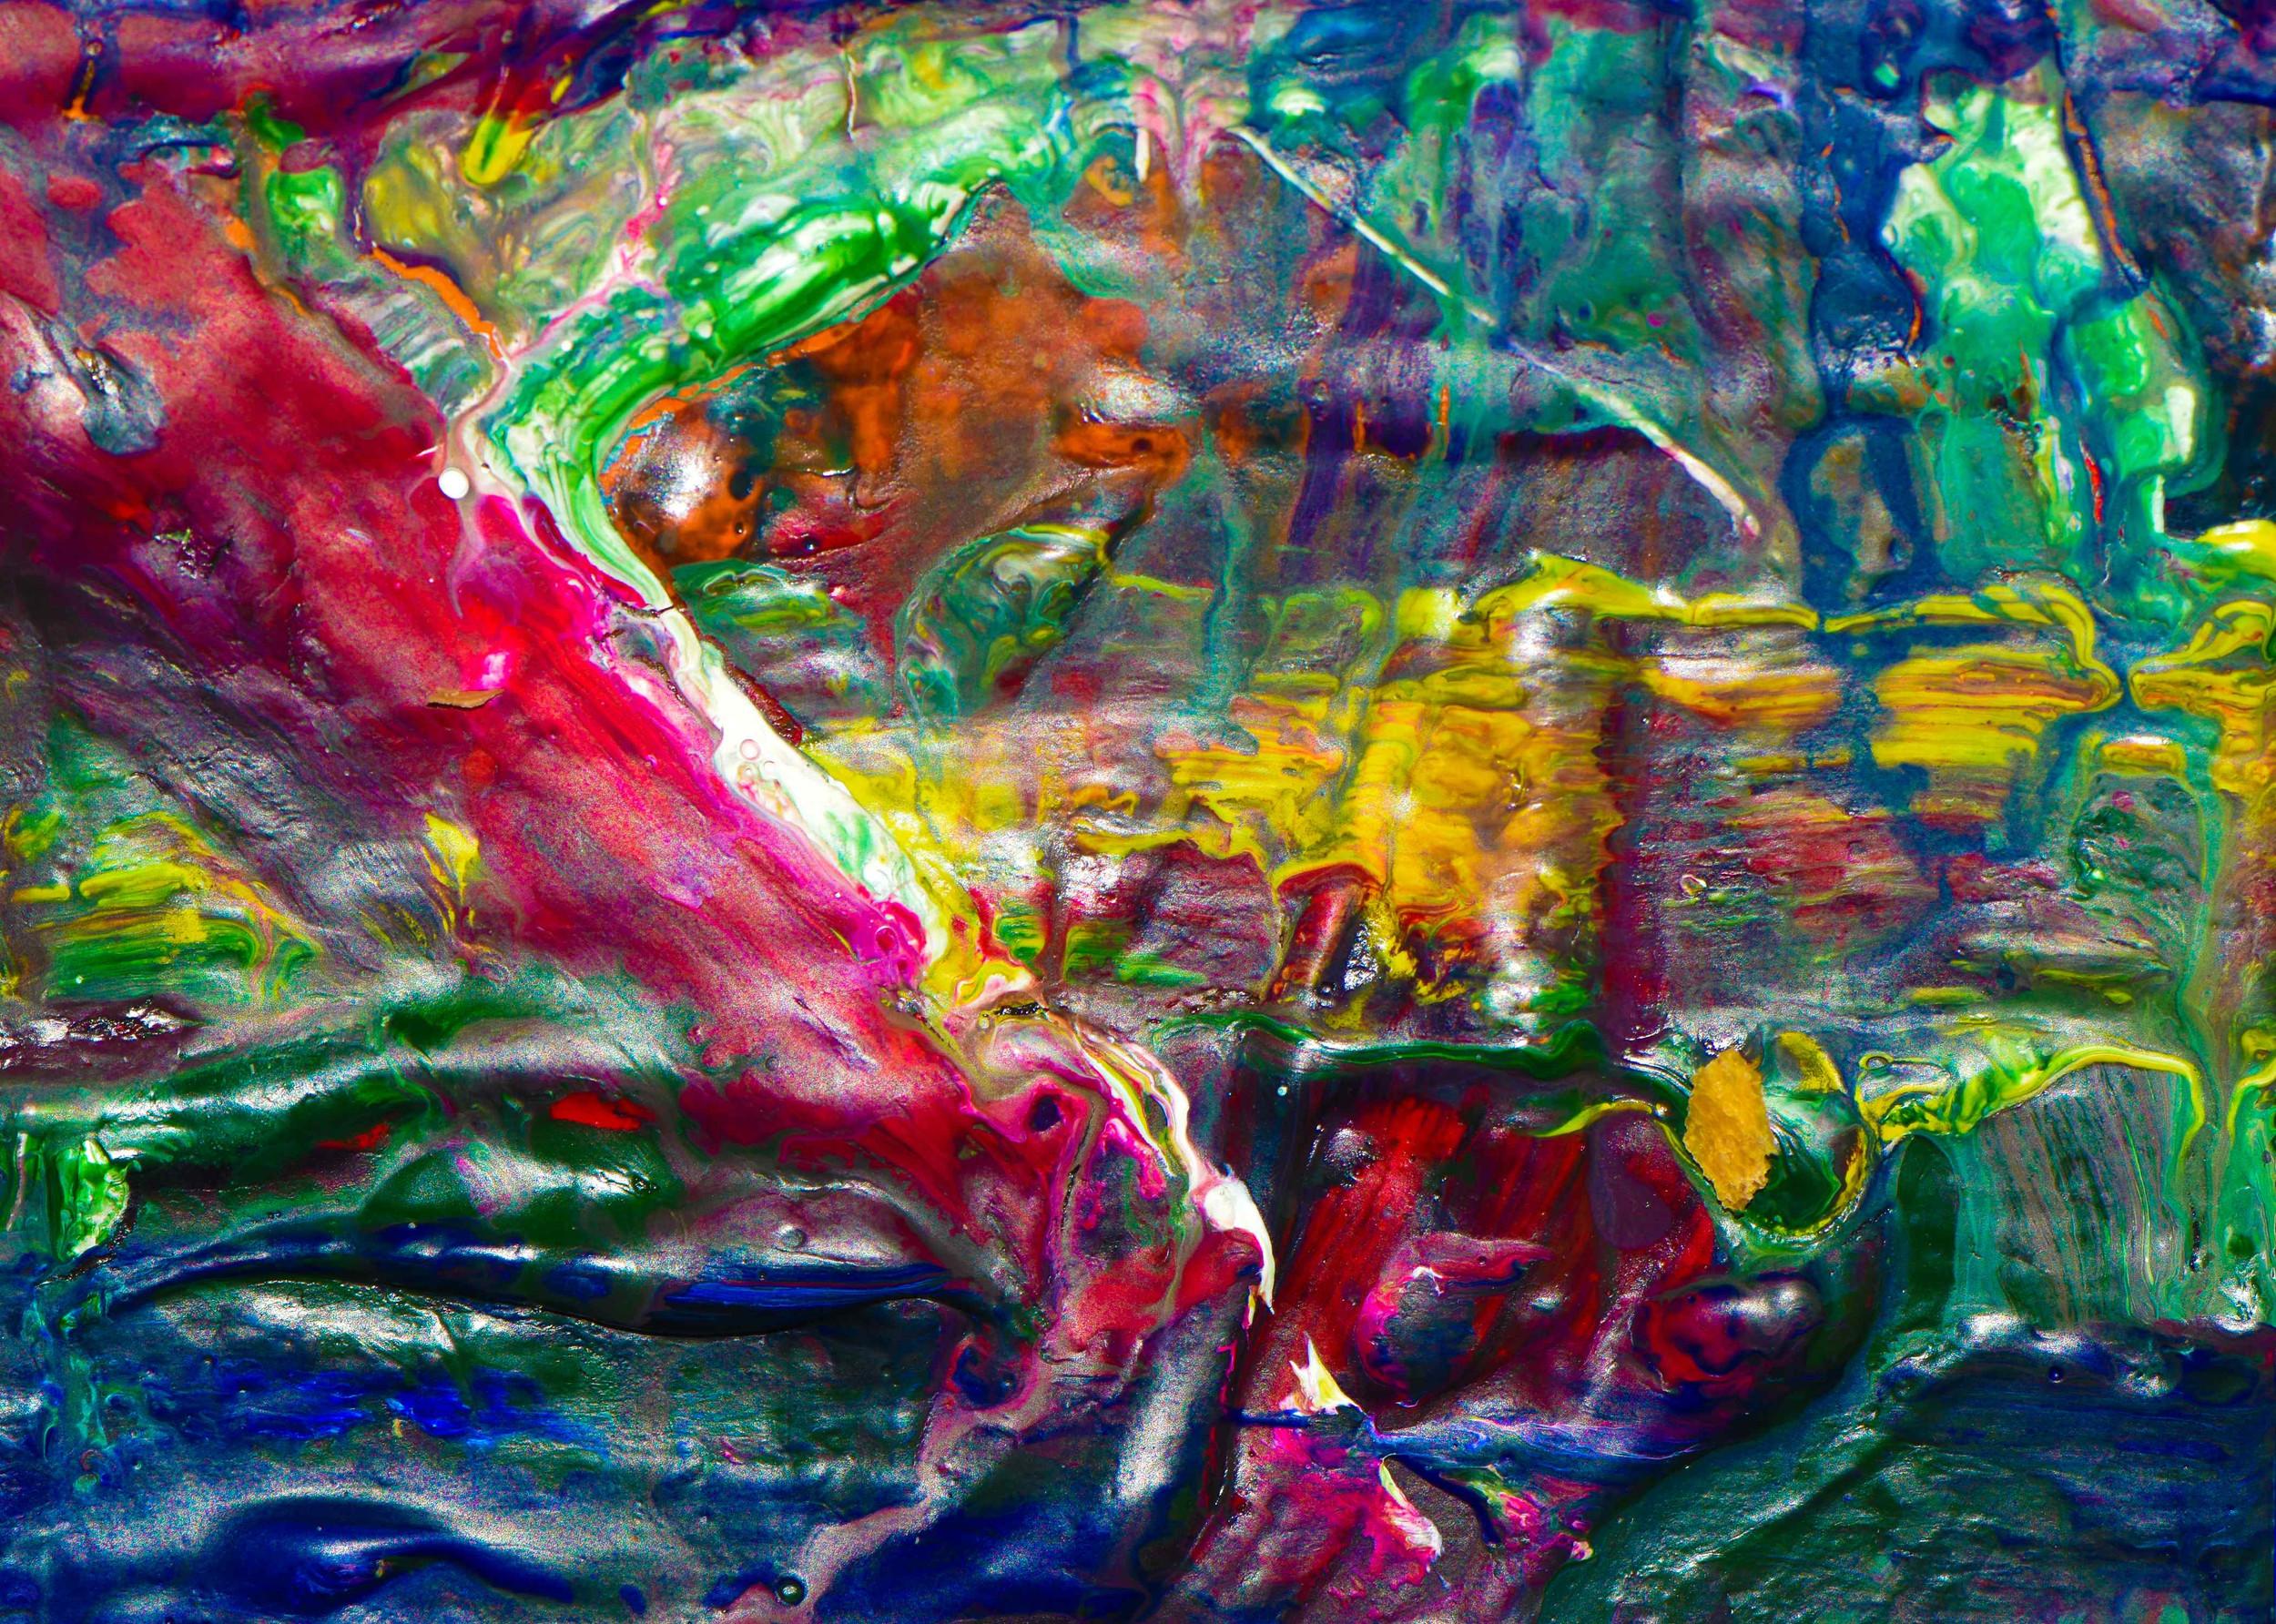 Home | Greg Furie Art